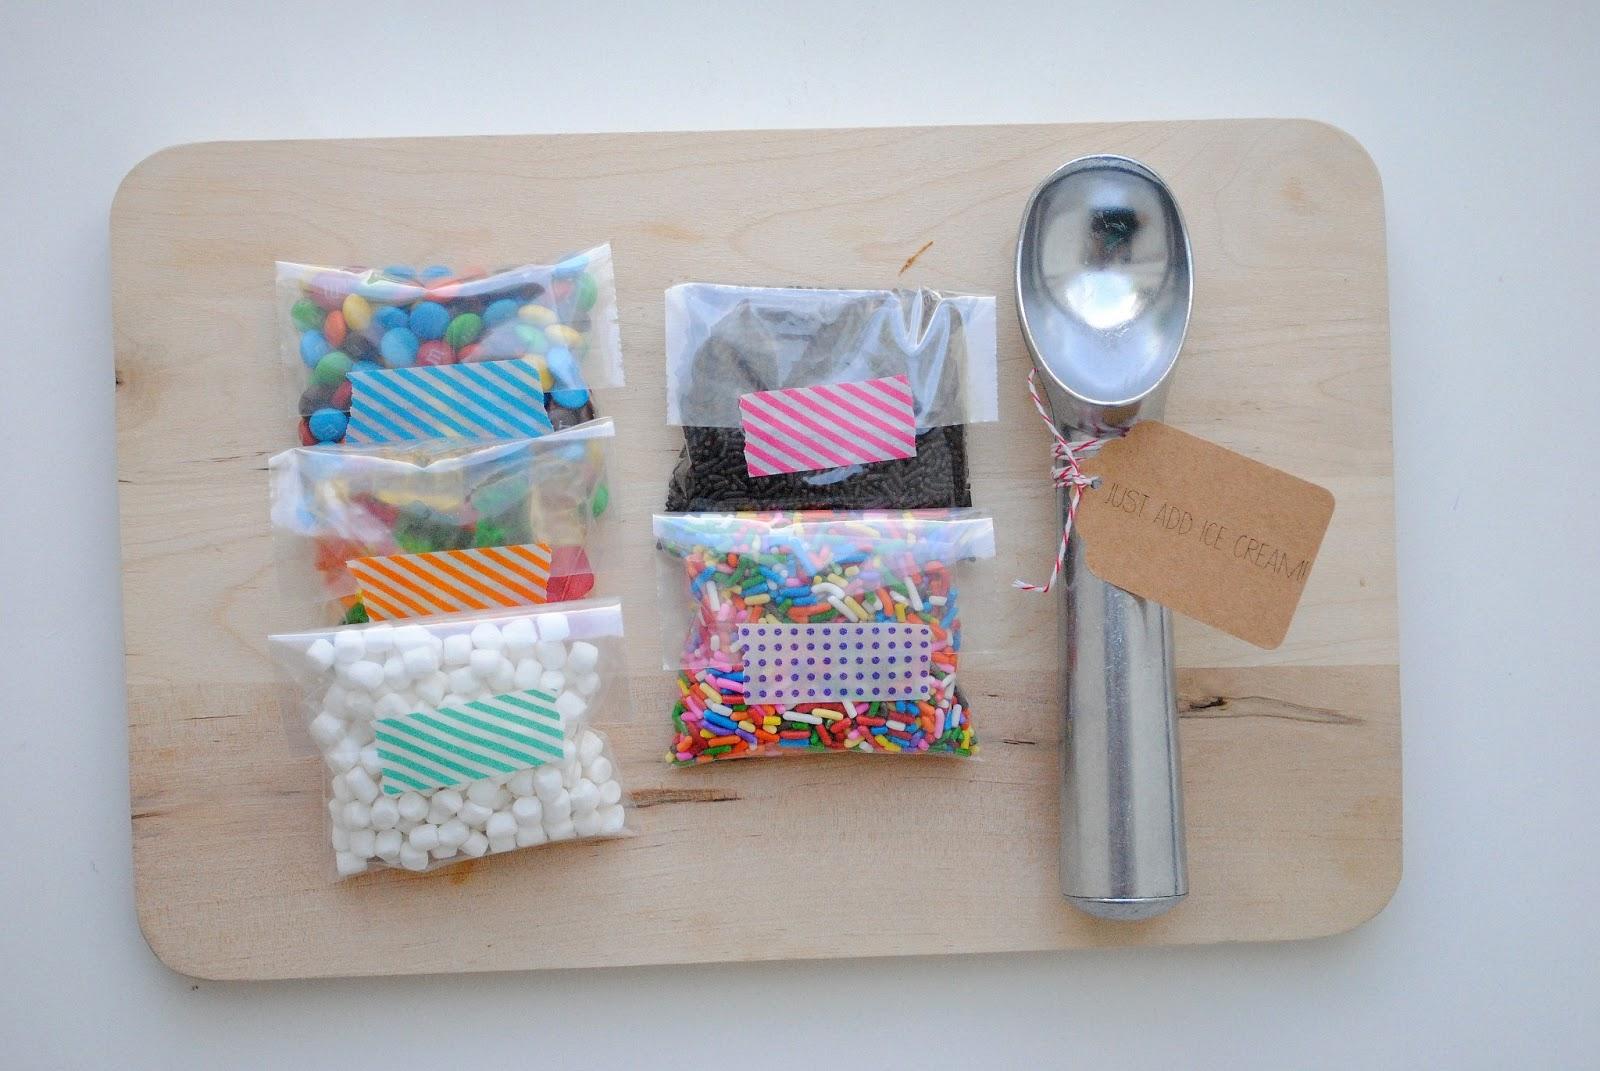 end of the year teacher gifts diy ice cream sundae kits. Black Bedroom Furniture Sets. Home Design Ideas